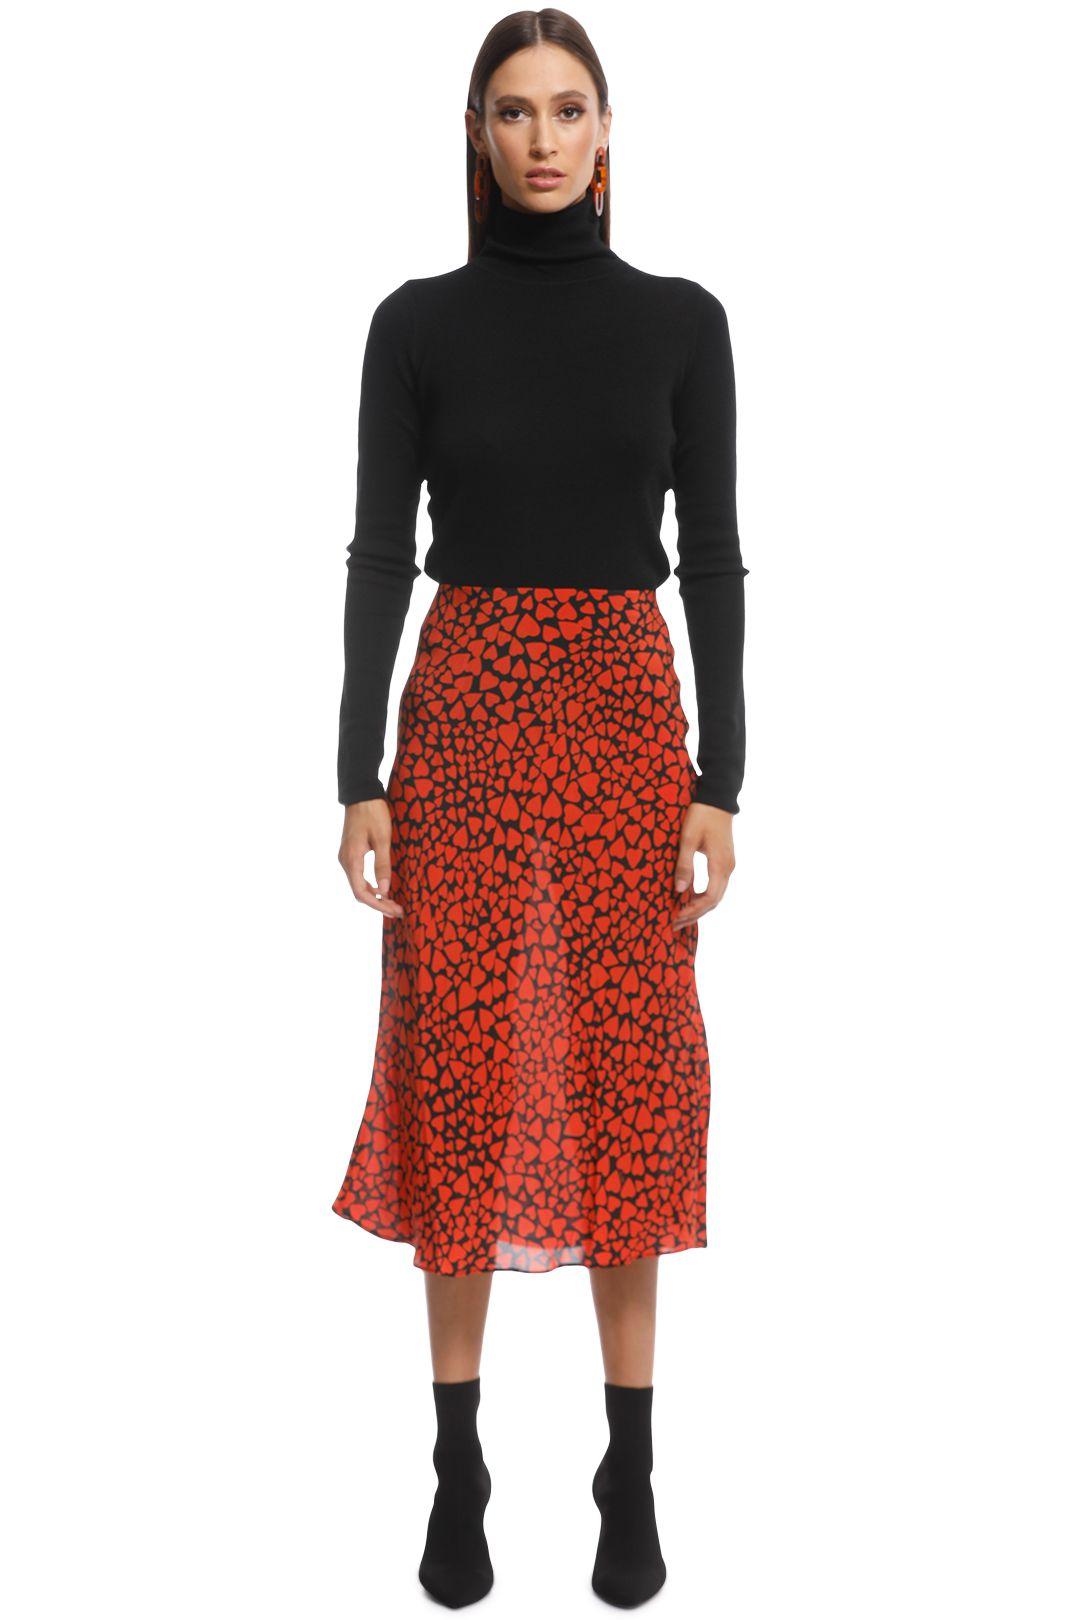 Realisation Par - The Naomi Skirt - Sid - Front